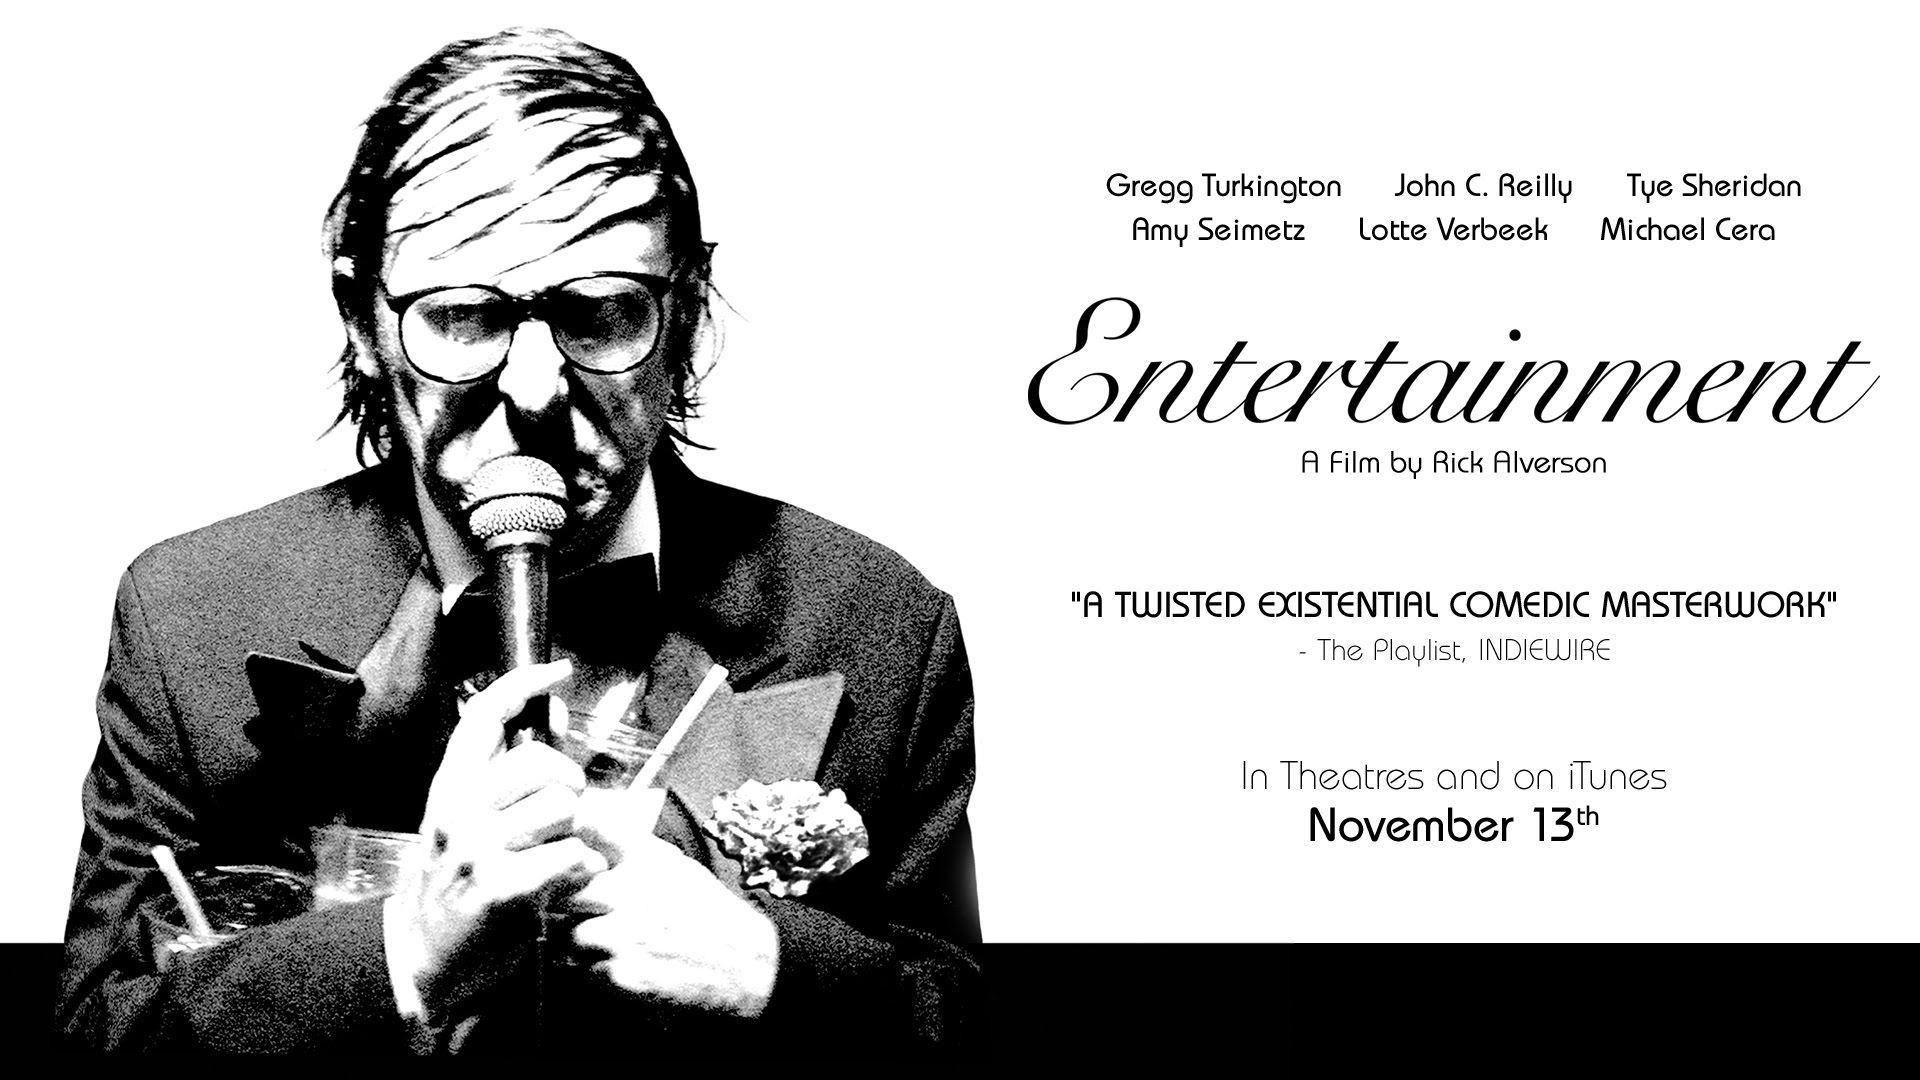 ENTERTAINMENT featuring John C. Reilly, Tye Sheridan